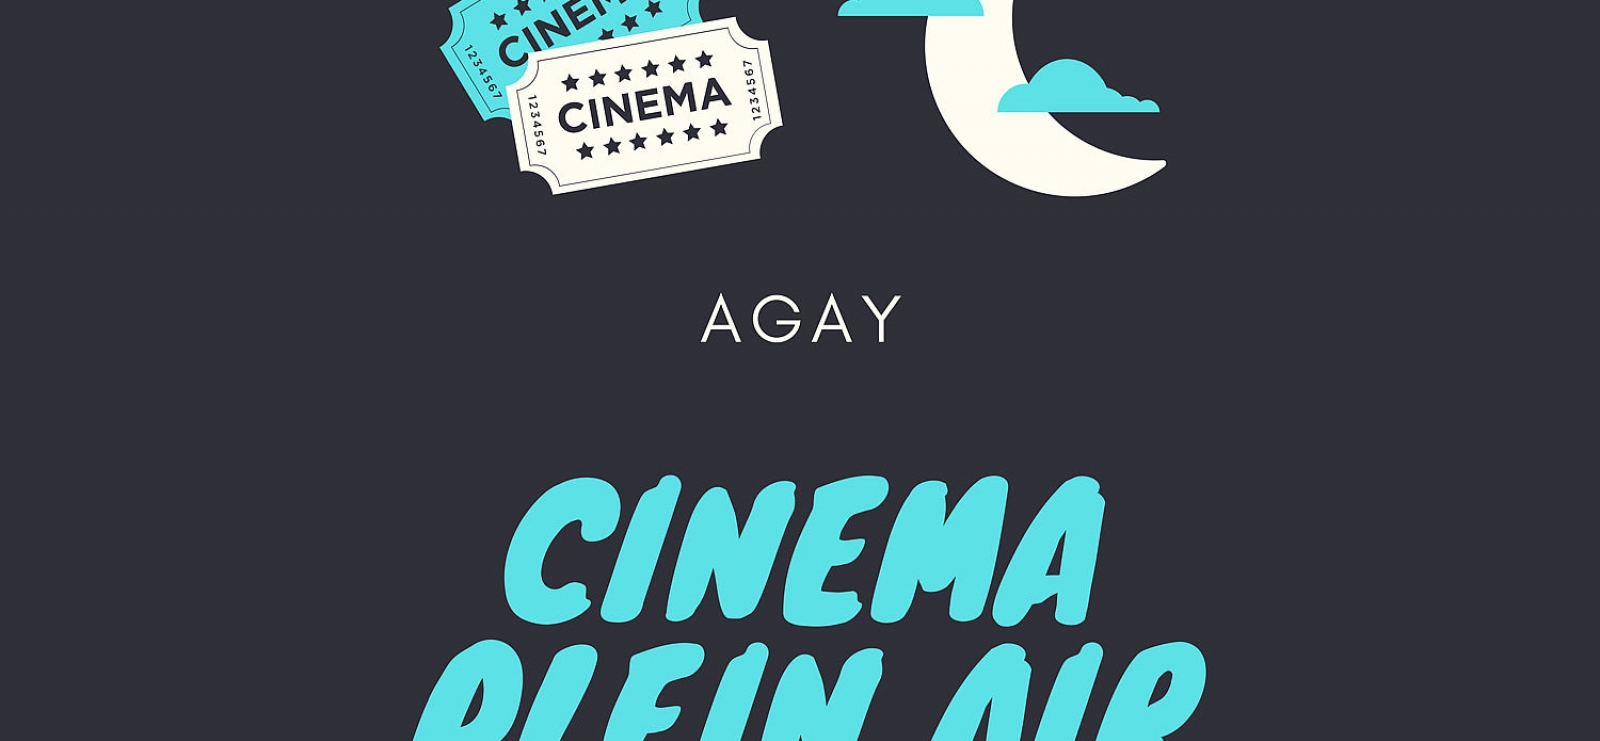 Cinéma en plein air - AGAY